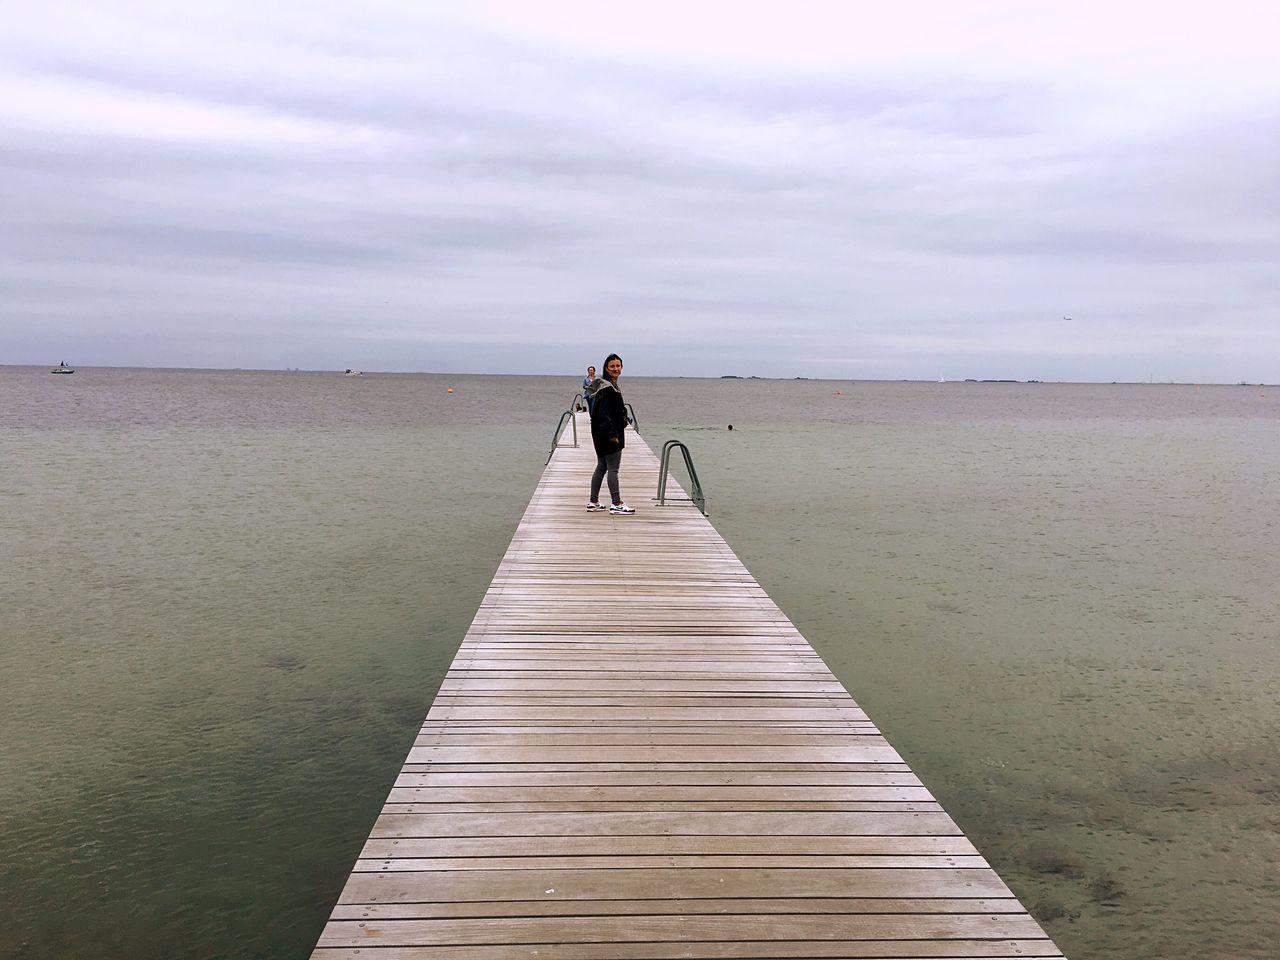 Copenhagen has a beach